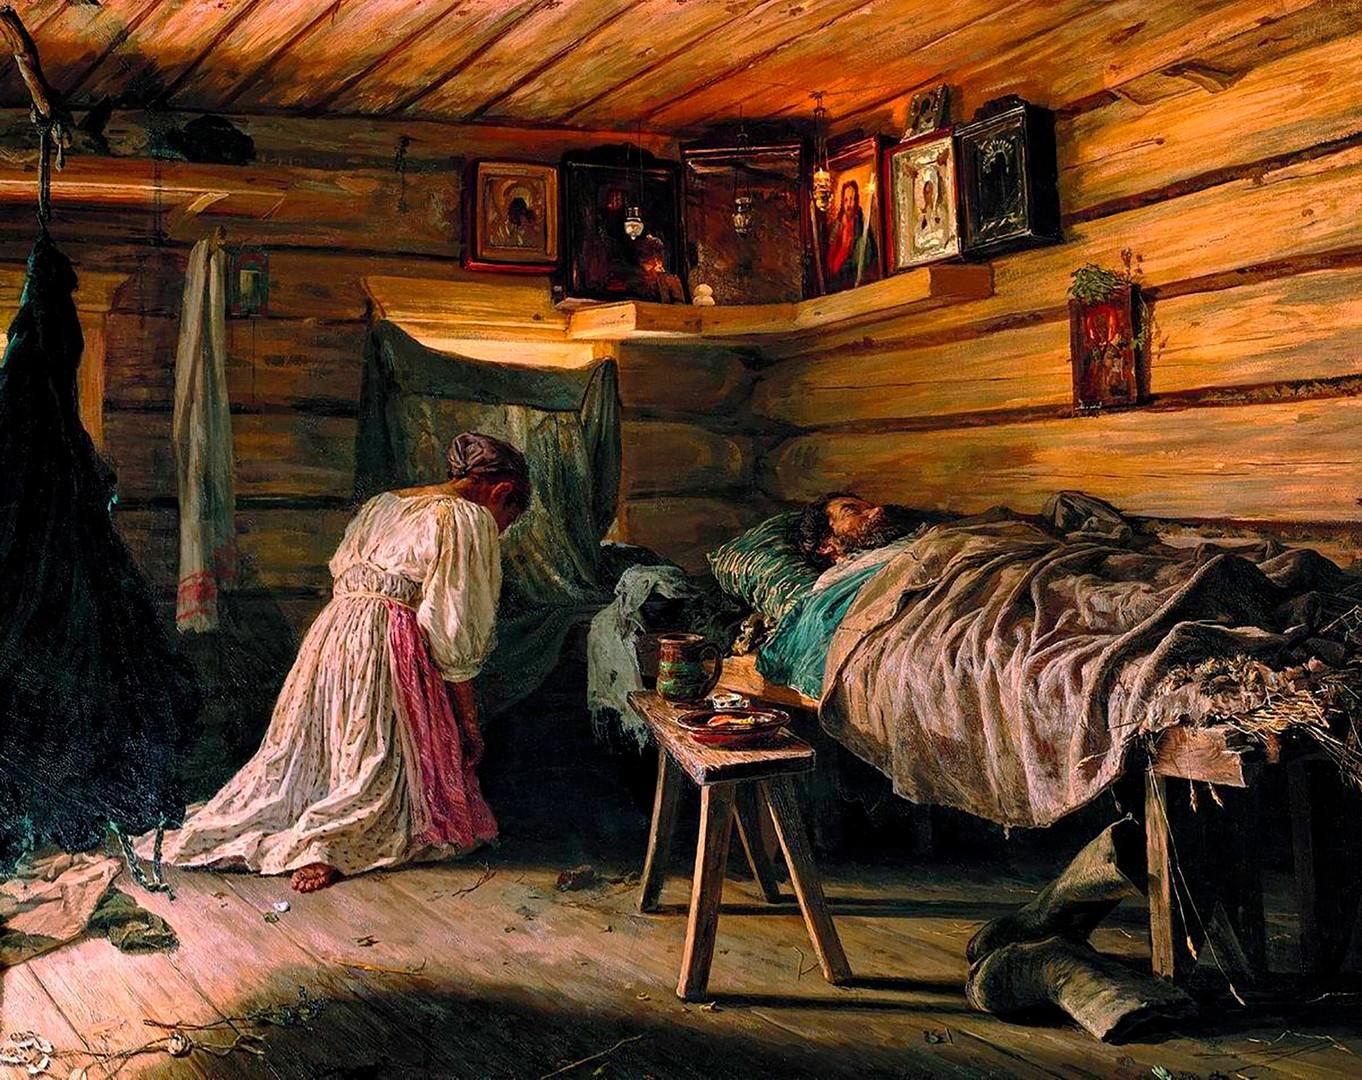 One Room House Siberia